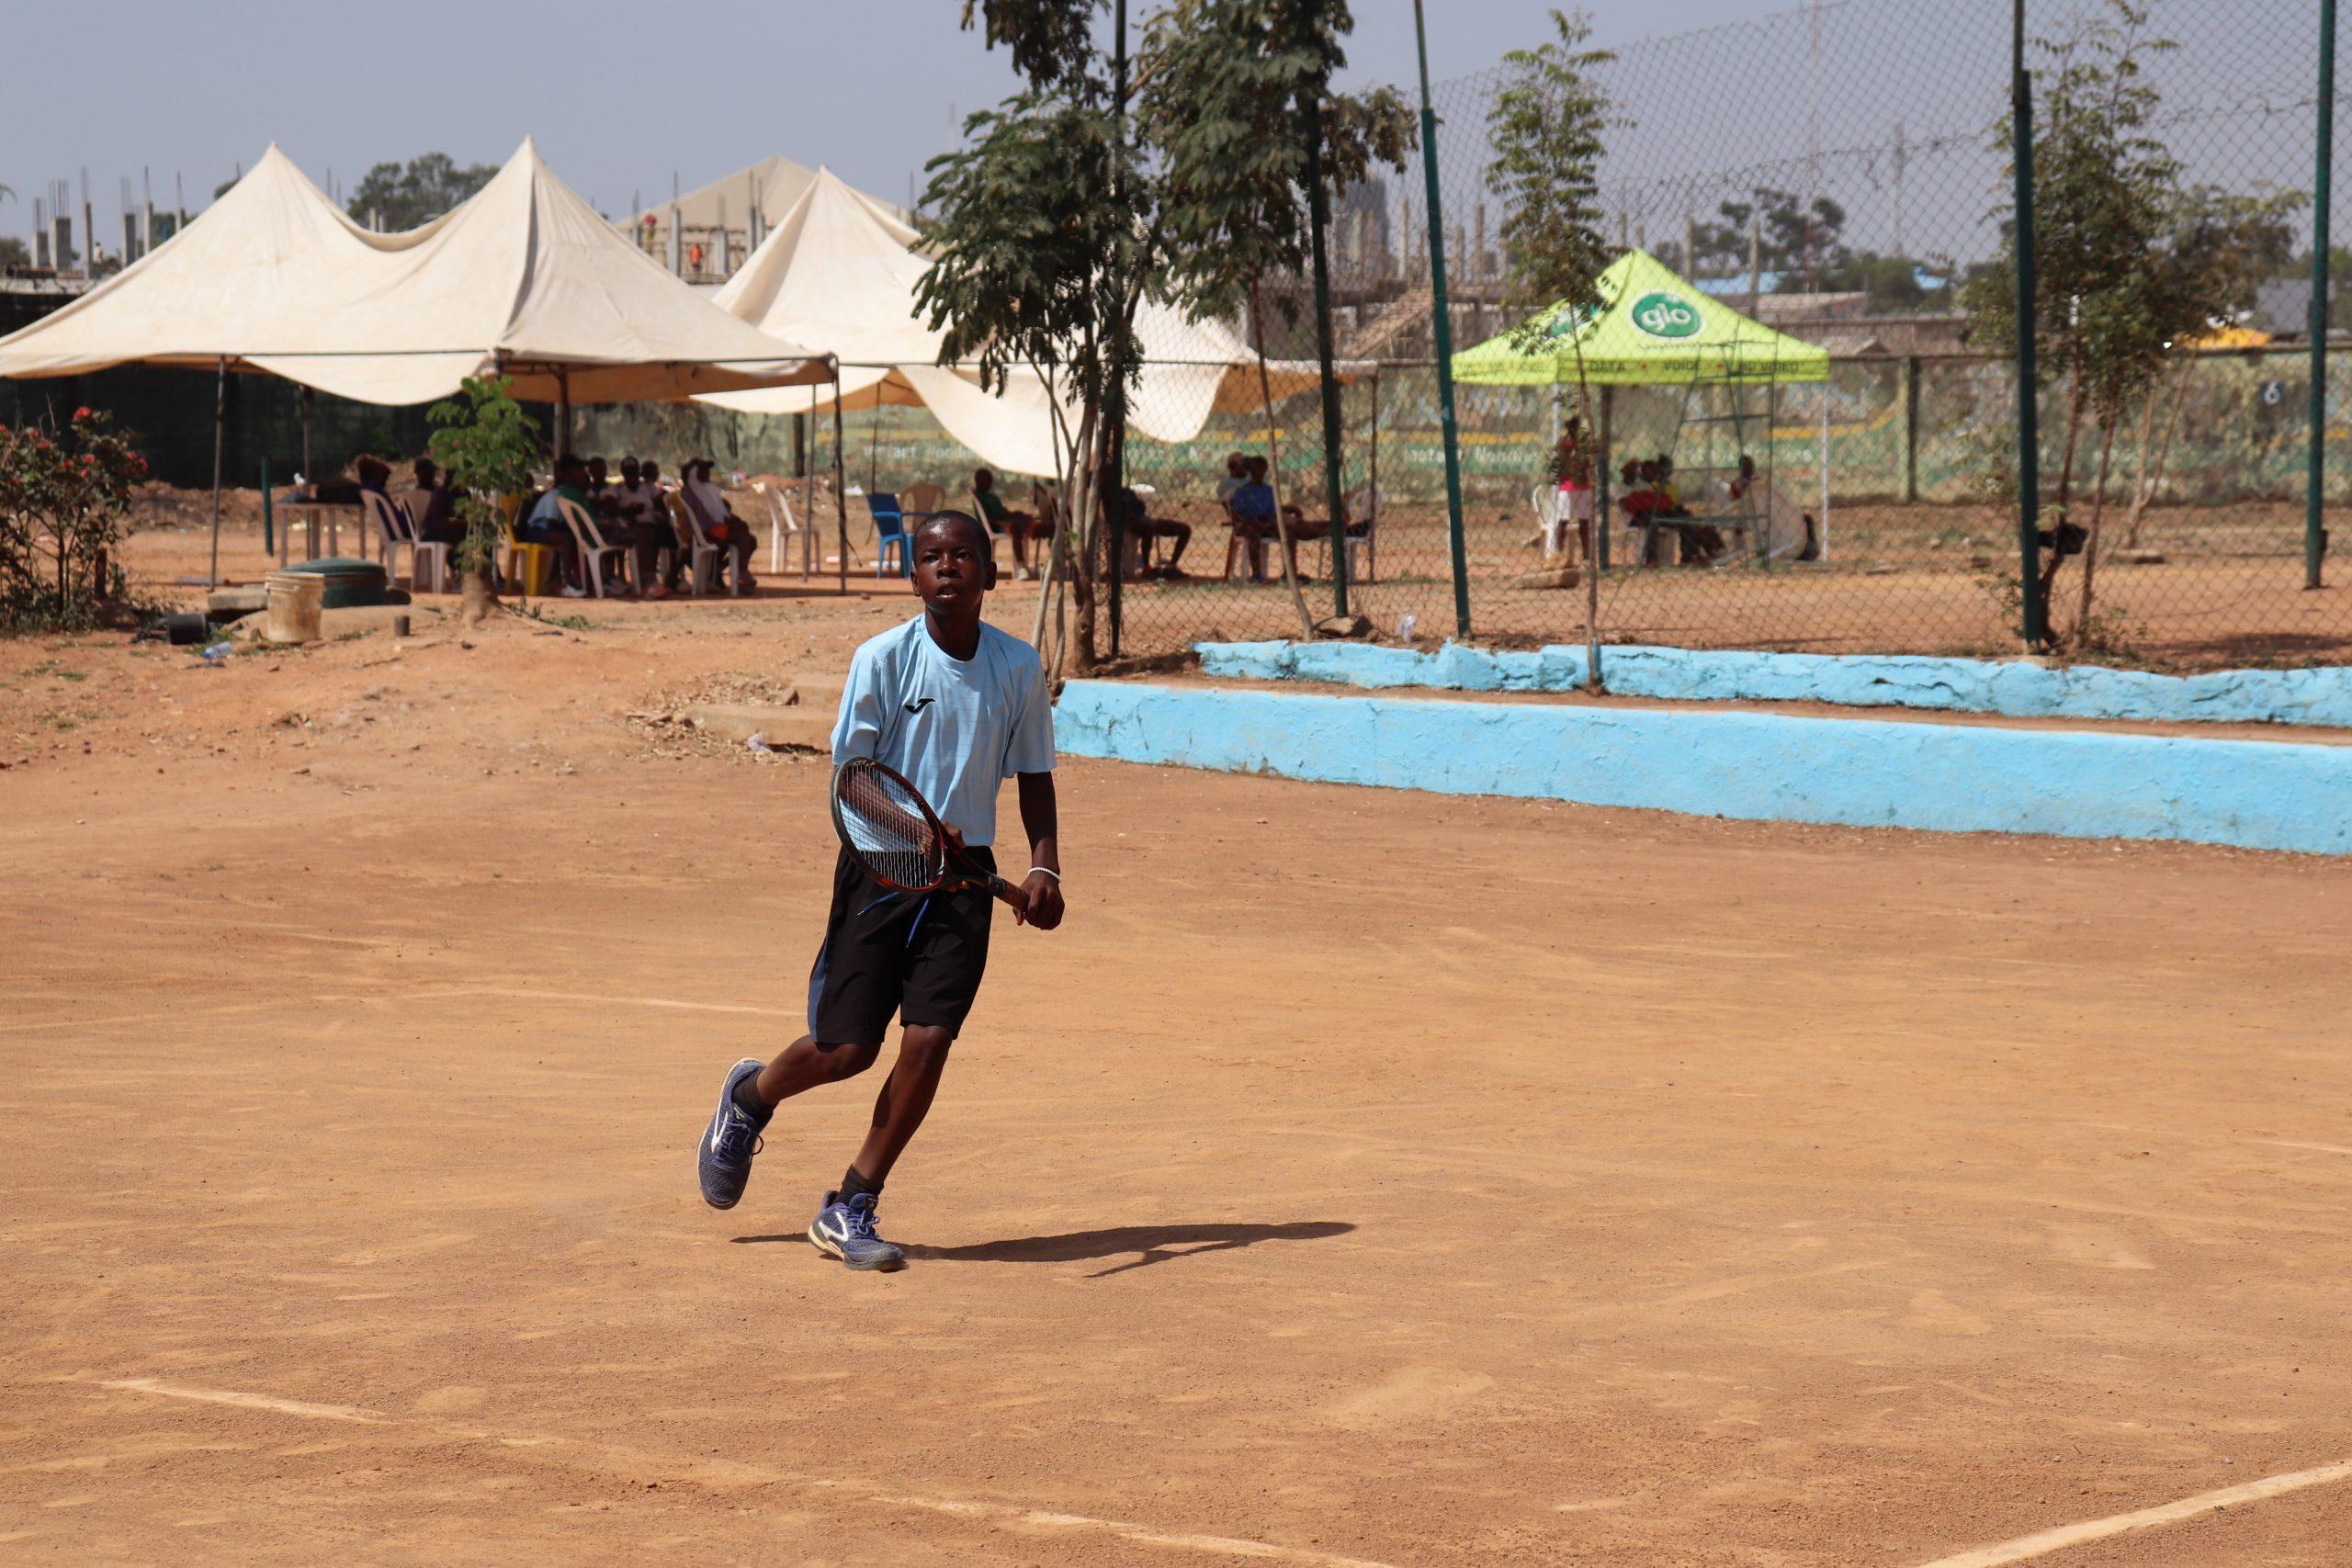 Seun Ogunsakin scaled